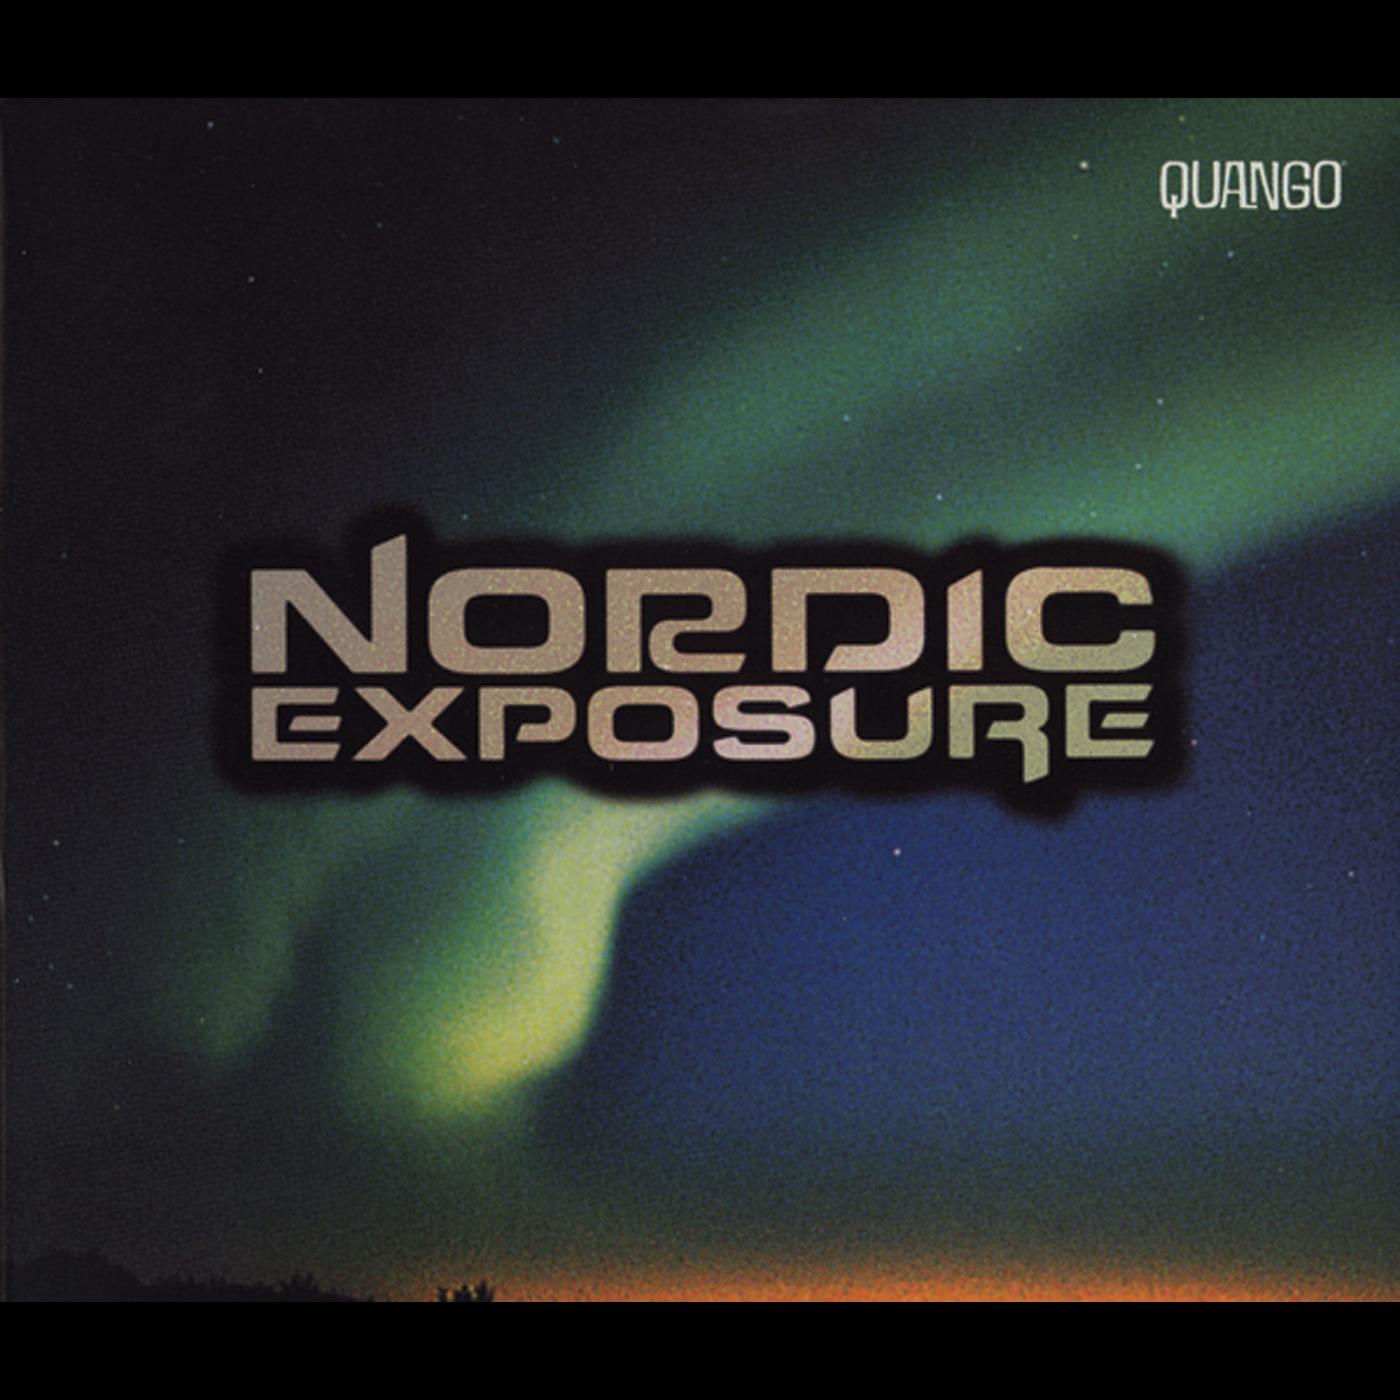 NordicExposure.jpg